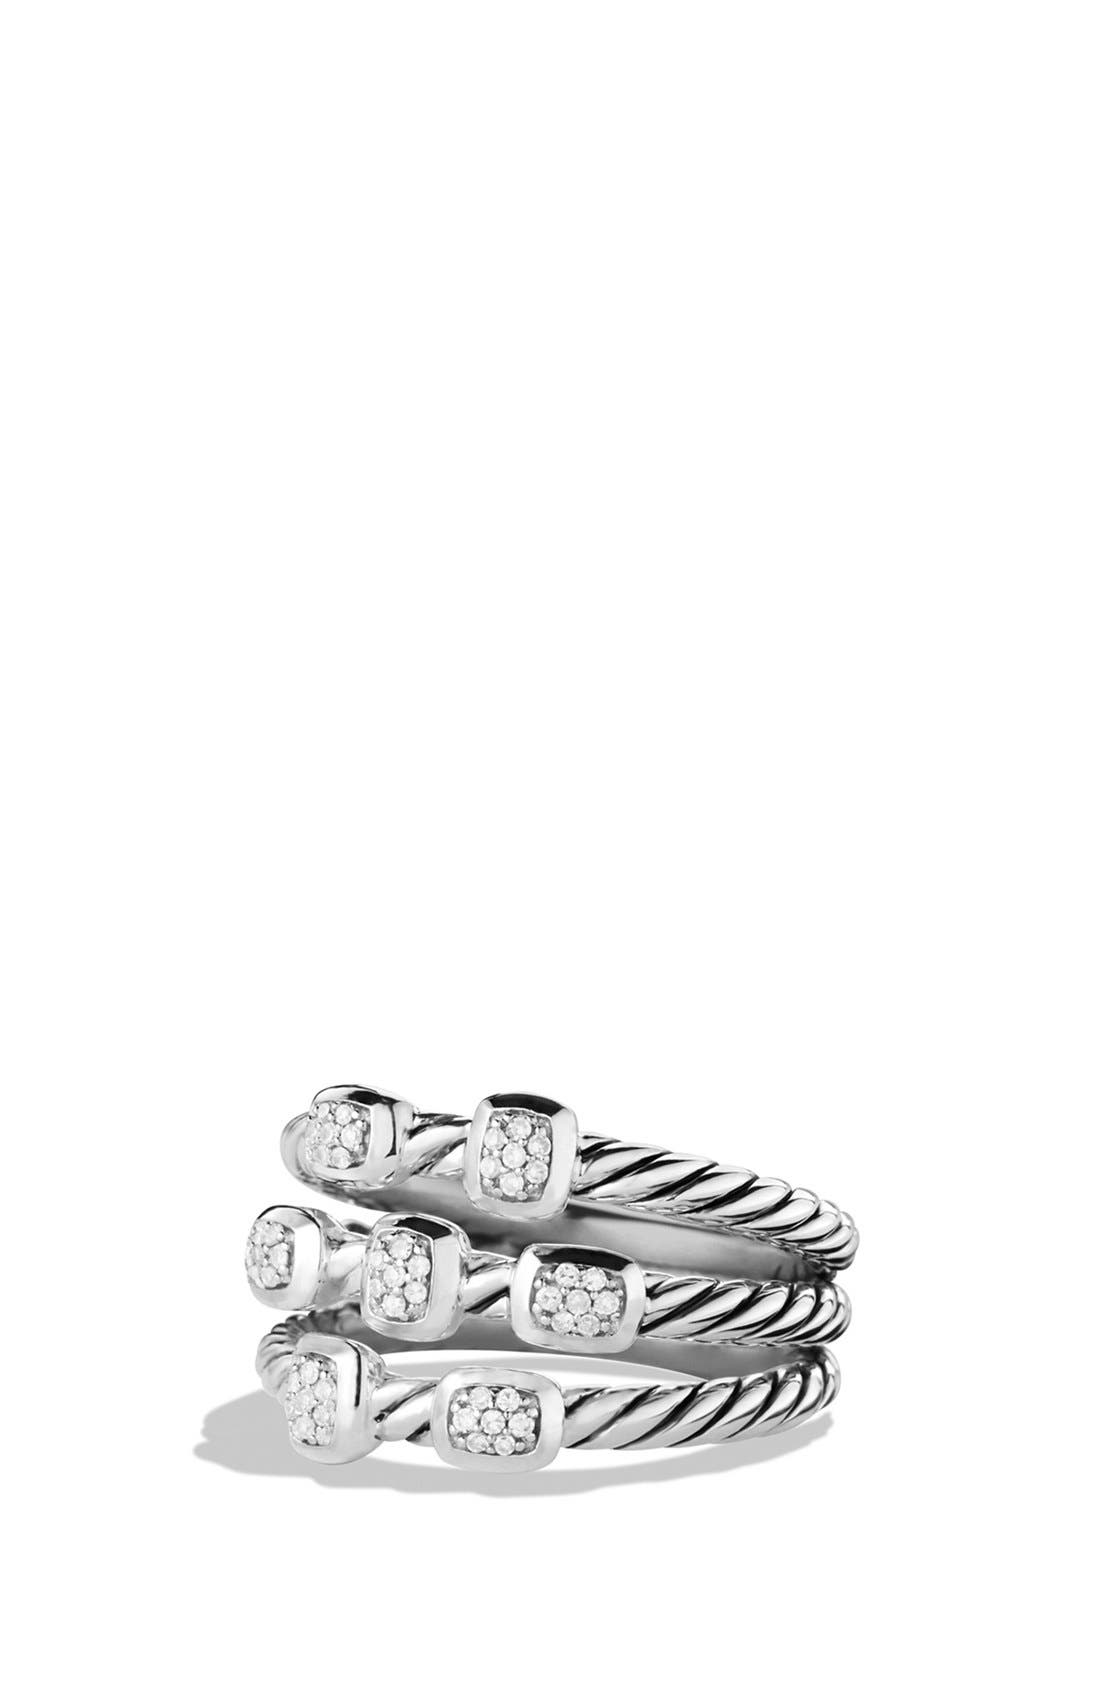 Alternate Image 1 Selected - David Yurman 'Confetti' Ring with Diamonds